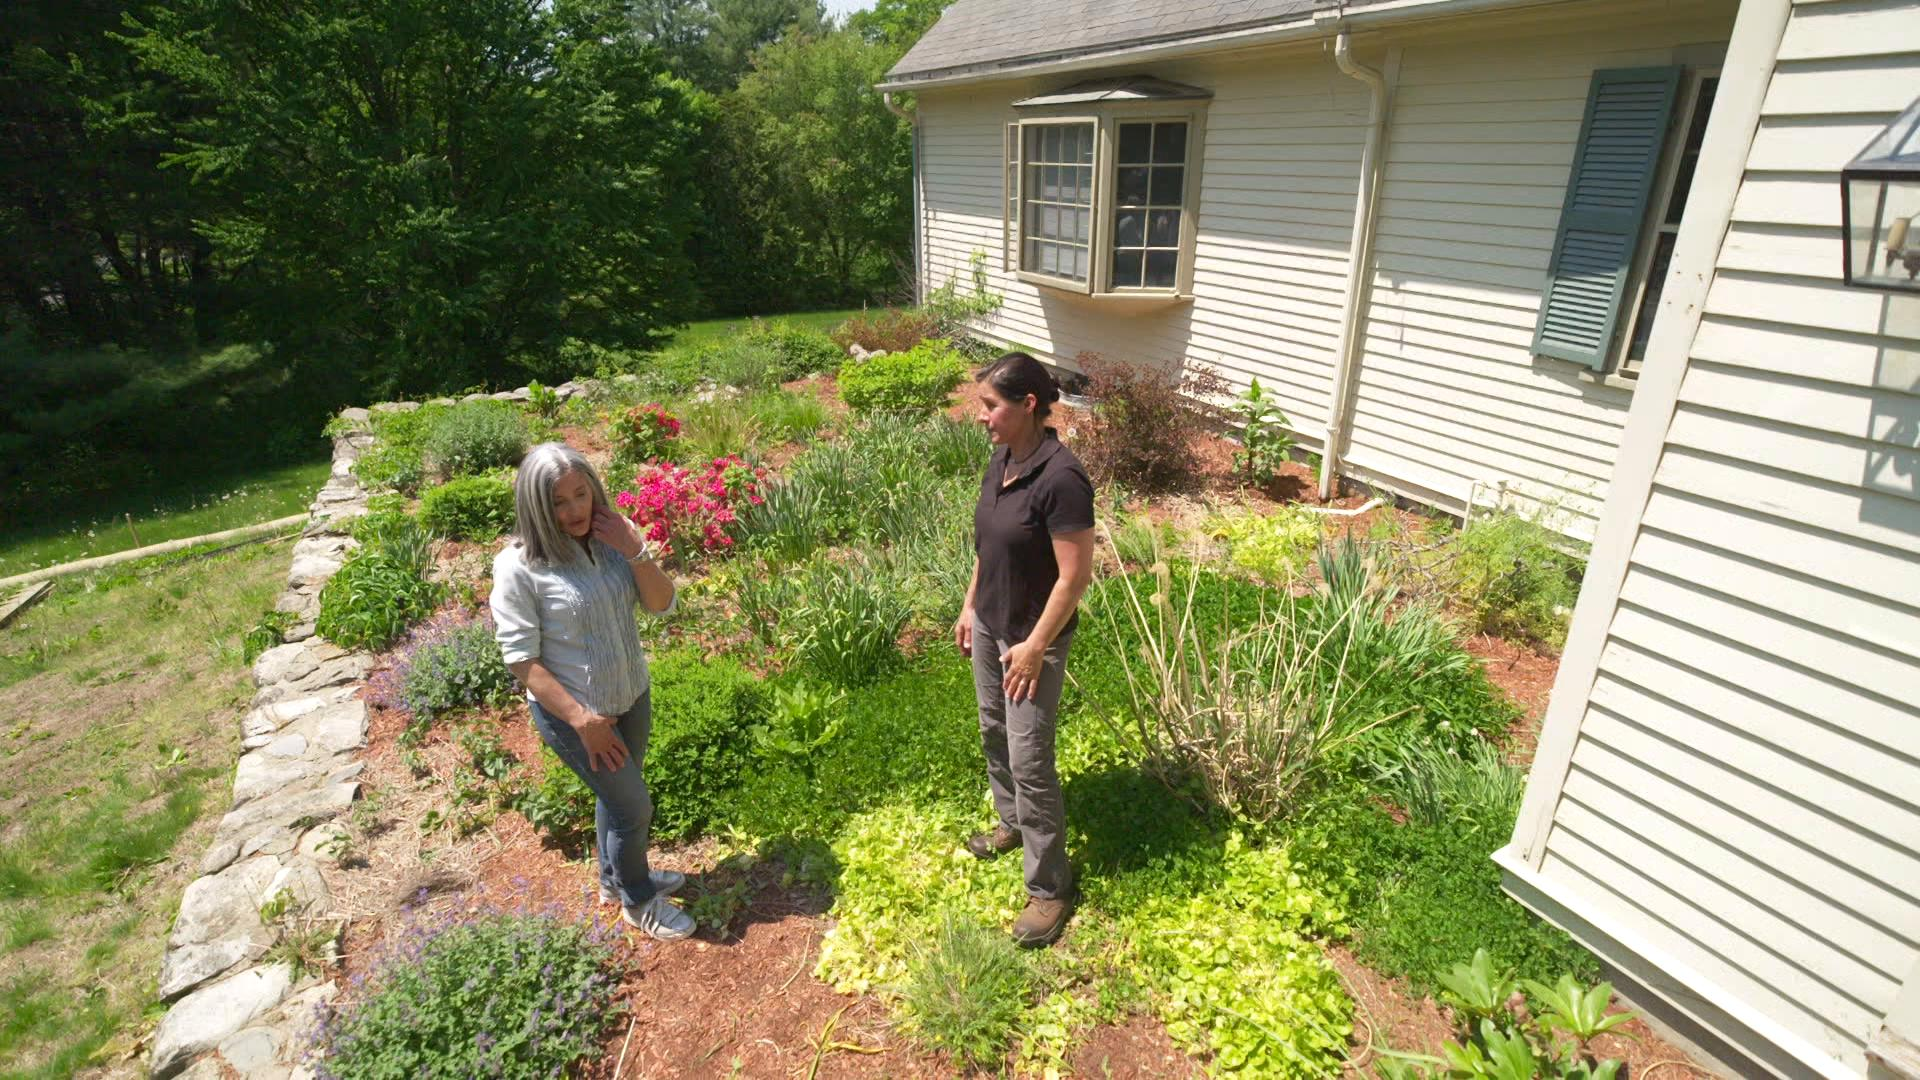 S43 E3, Jenn Nawada meets Maria Wheeler to go over the landscape plan